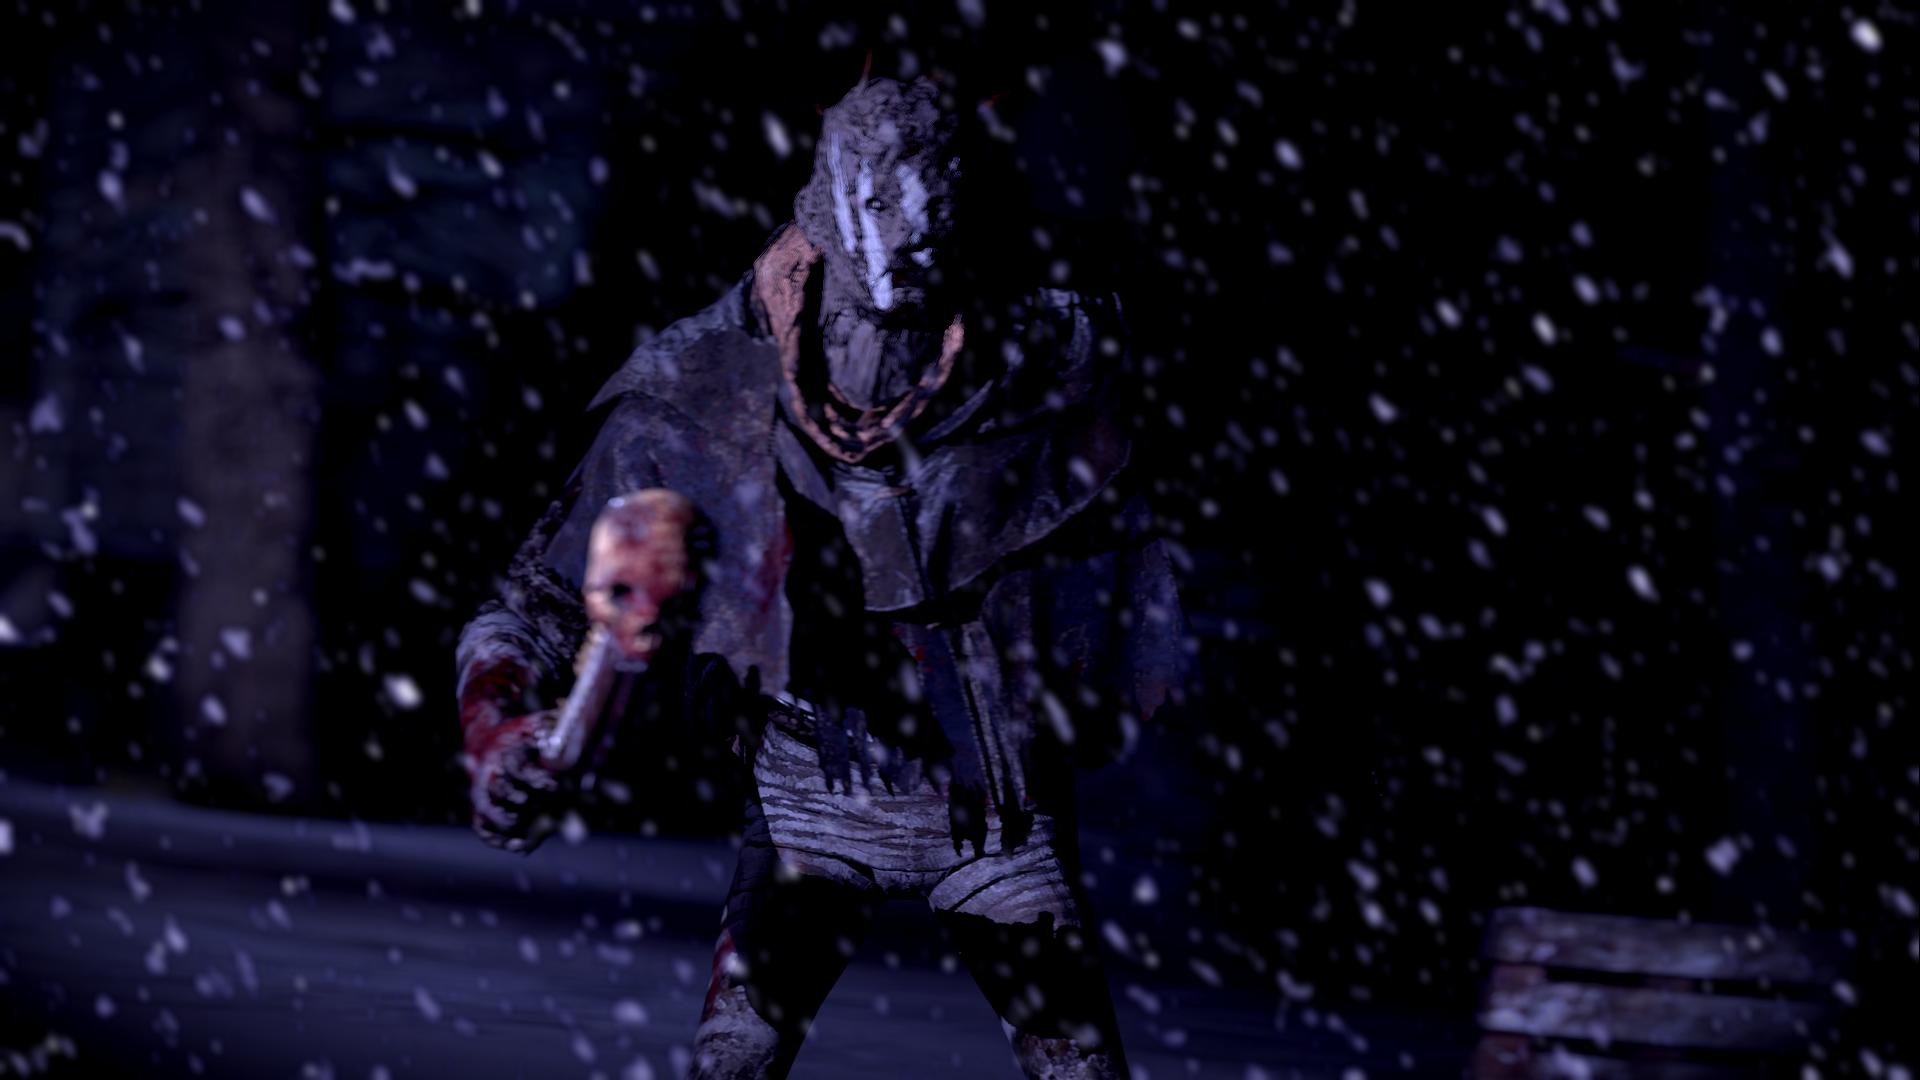 Wraith By Foxyplush On Deviantart